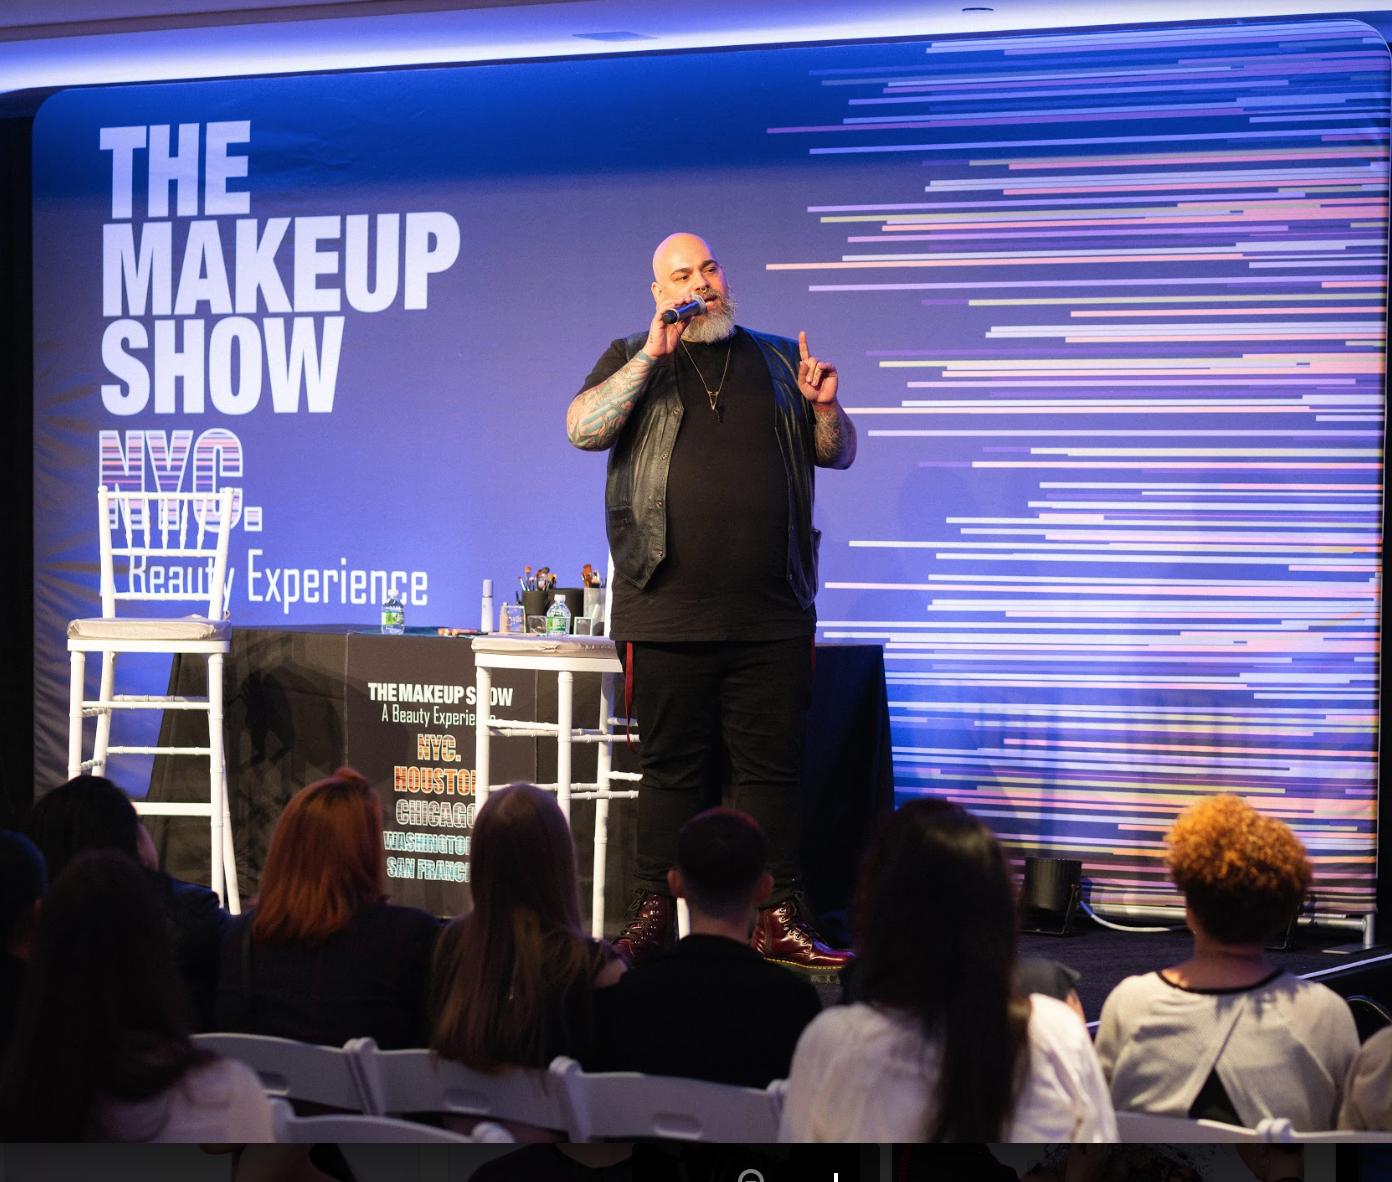 The-Makeup-Show-Elle-Harikleia3.png